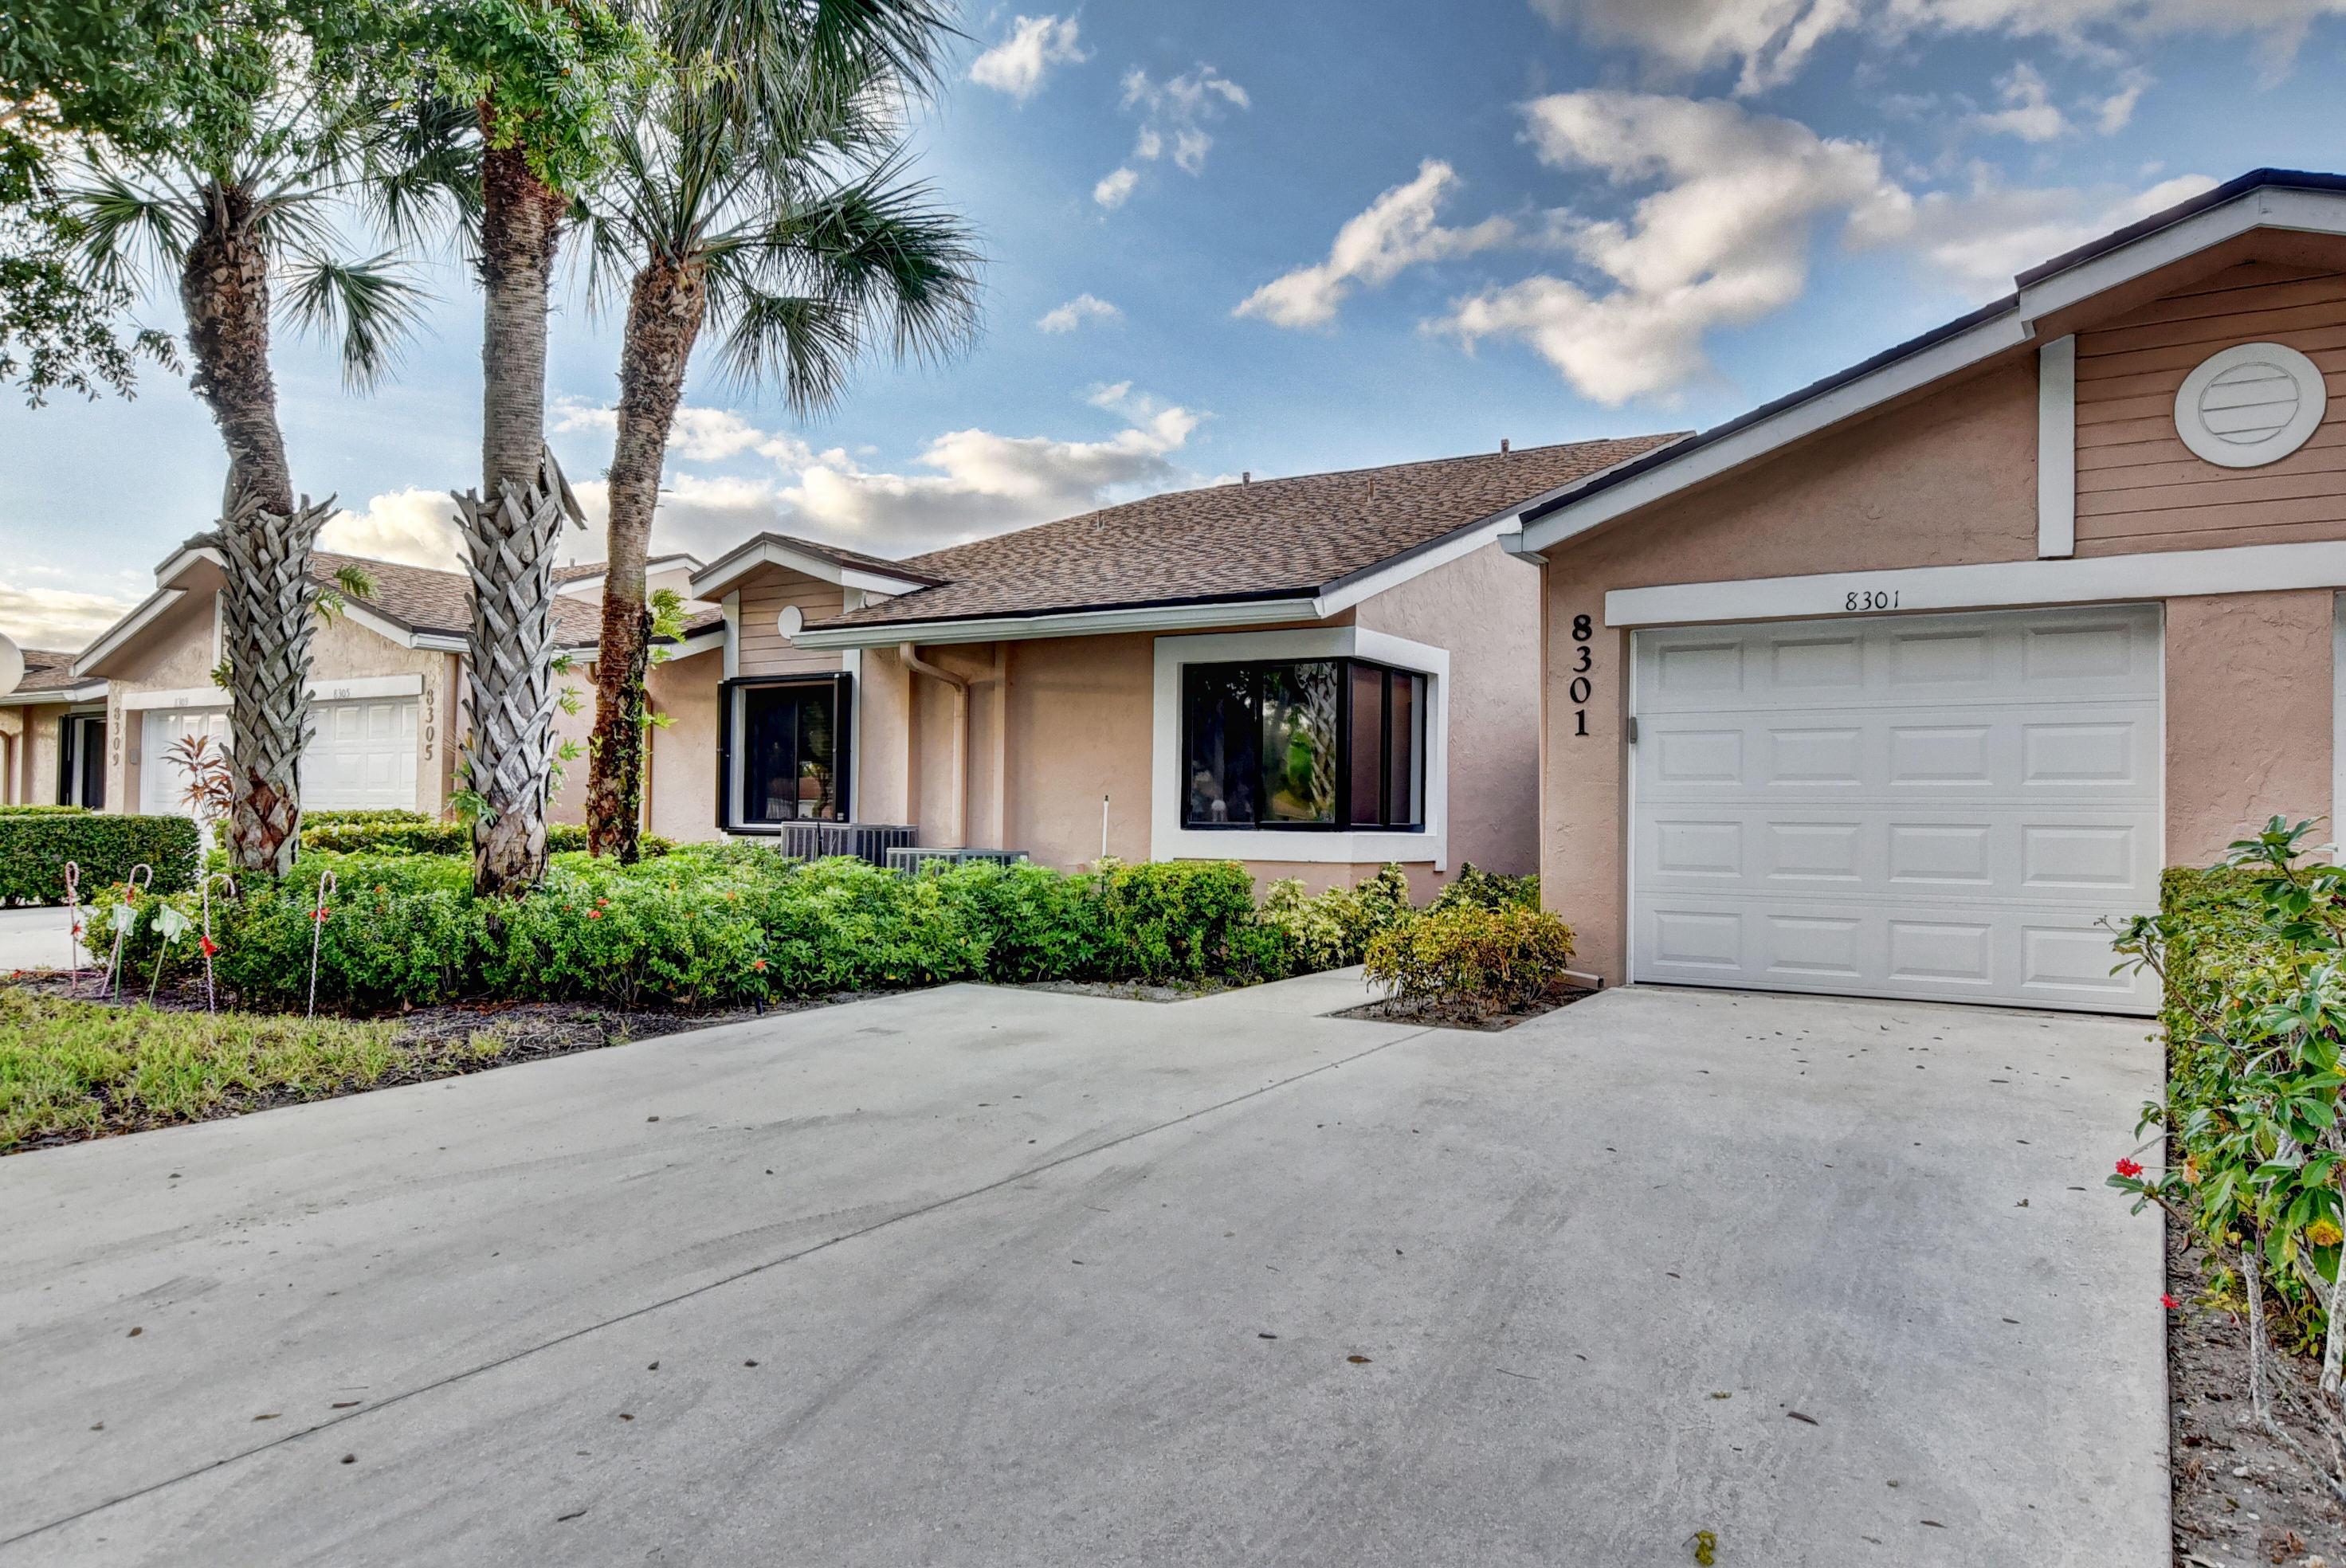 8301 Summersong Terrace Boca Raton, FL 33496